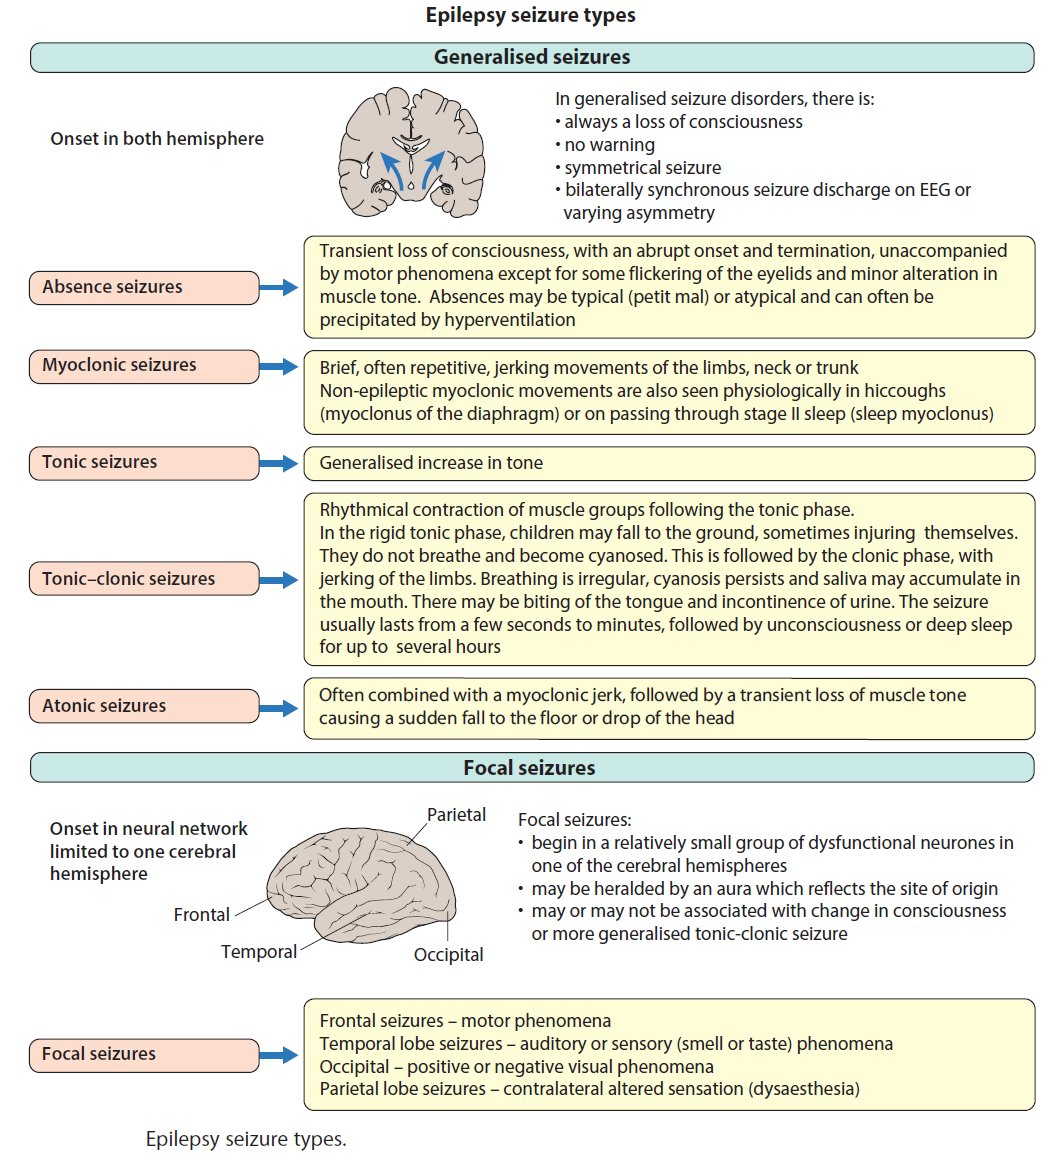 Epilepsy Seizure Types - Generalized vs Focal Generalized Seizures